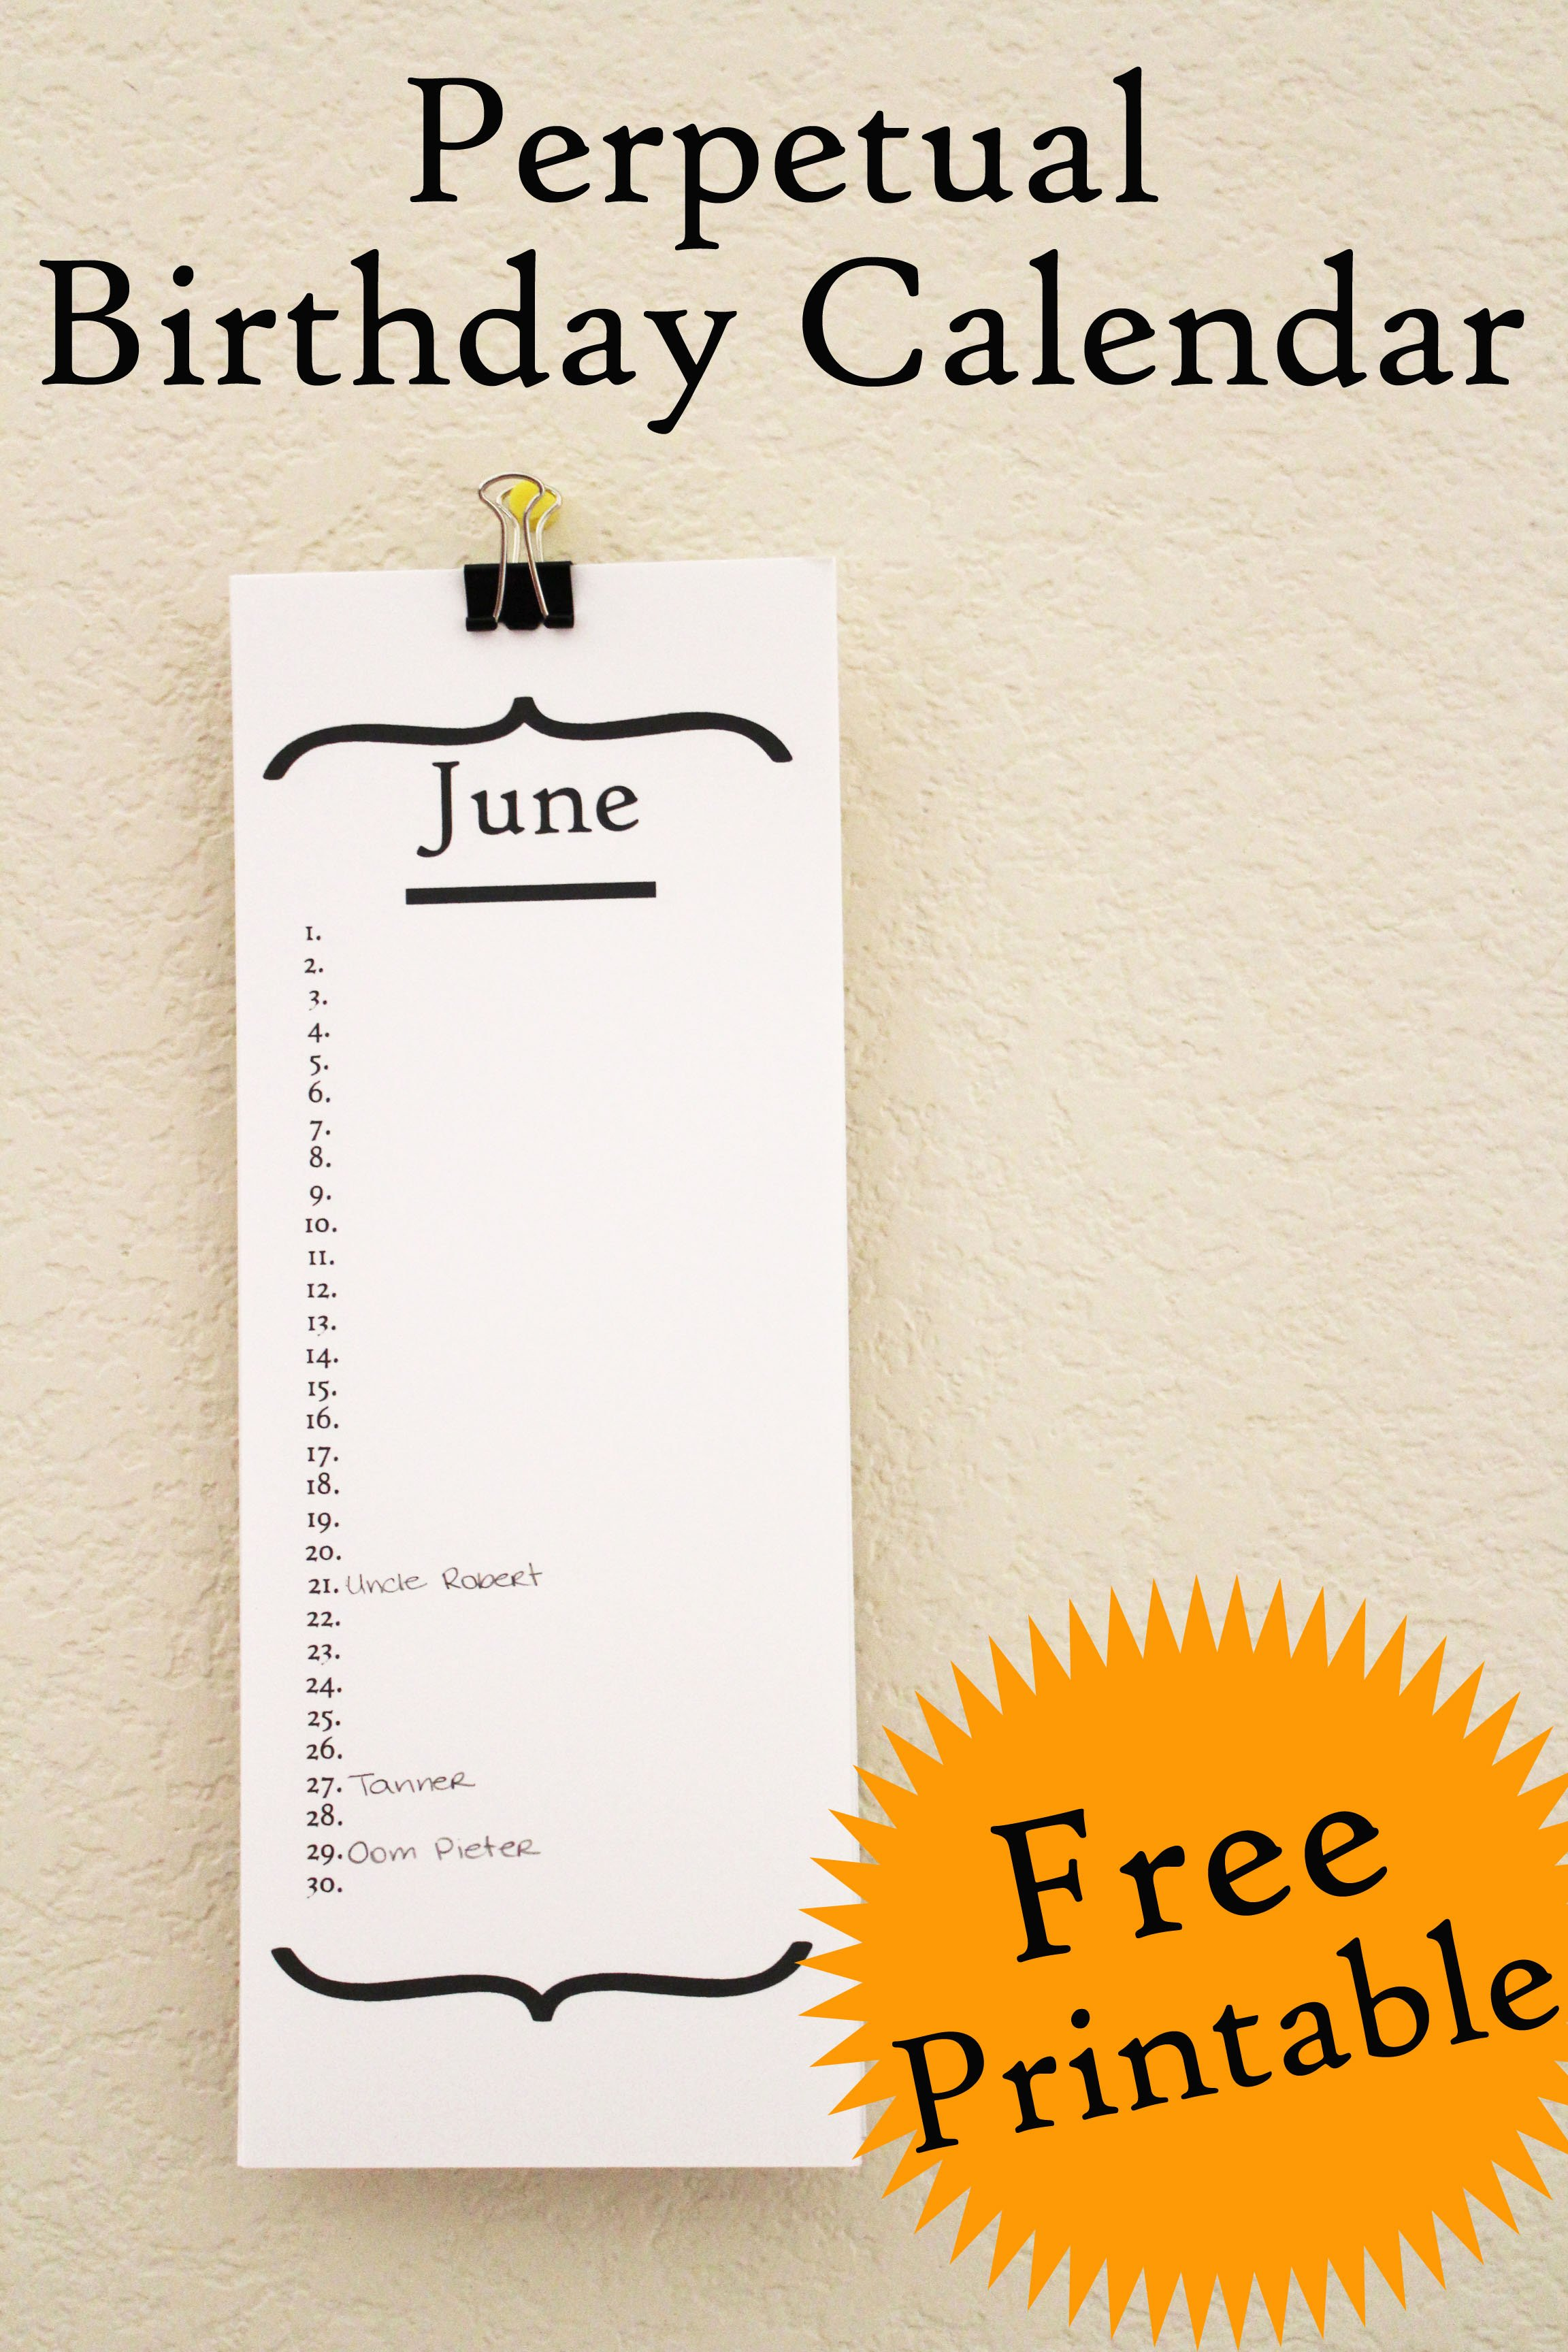 Free Printable Perpetual Calendar Beautiful Free Birthday Calendar Printable 30 Minute Crafts